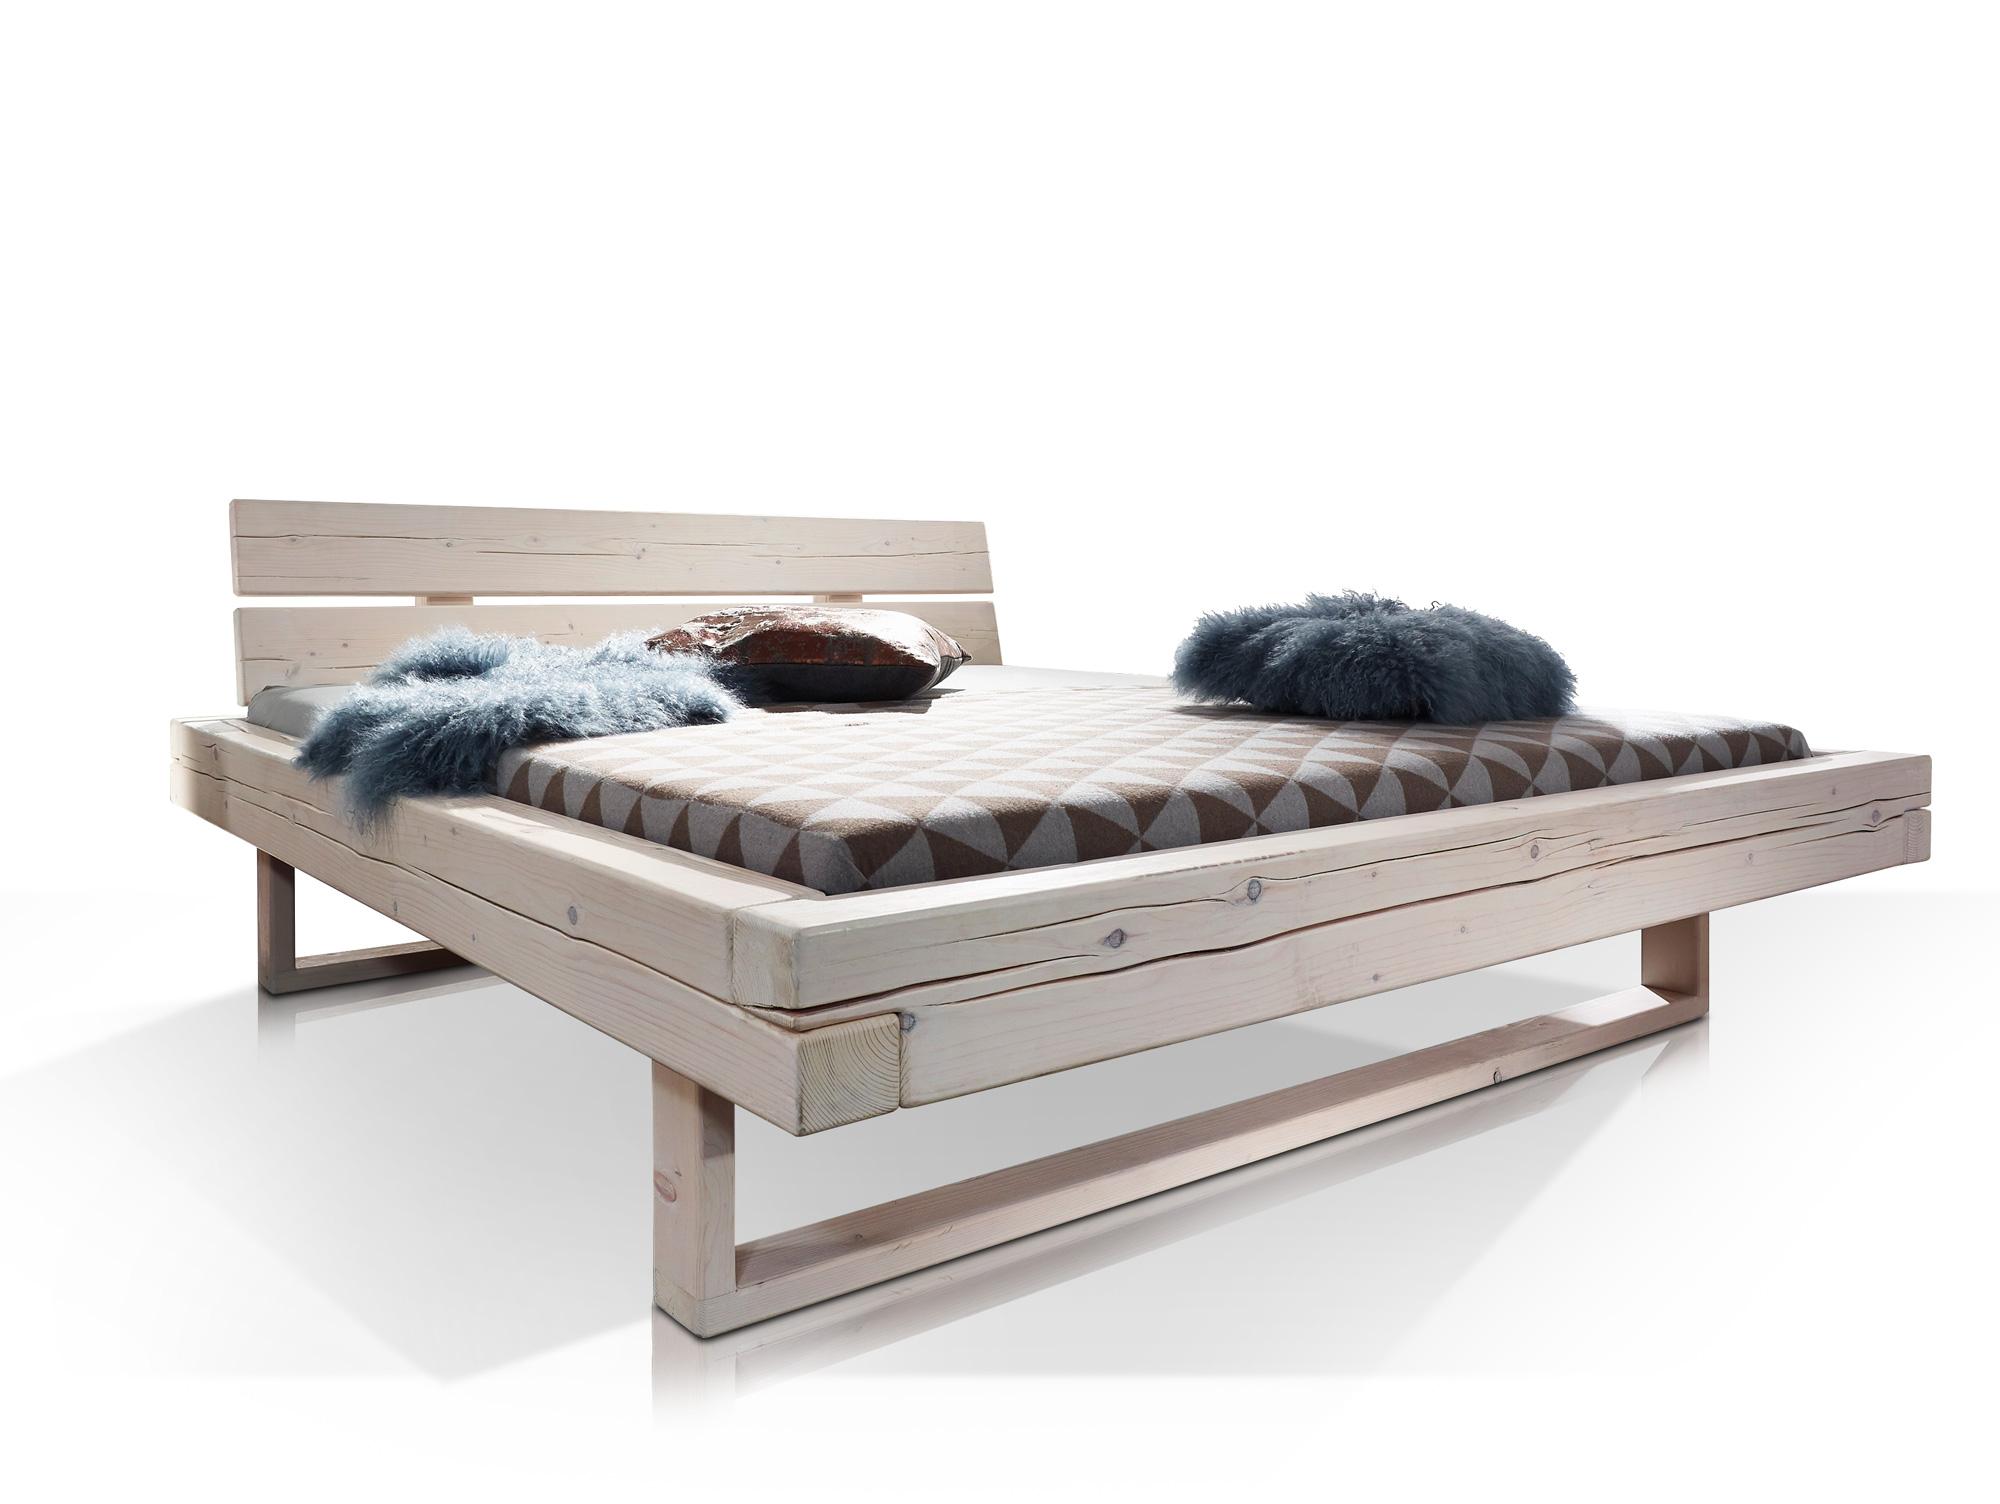 rob massivholzbett fichte weiss lasiert 160 x 200 cm. Black Bedroom Furniture Sets. Home Design Ideas